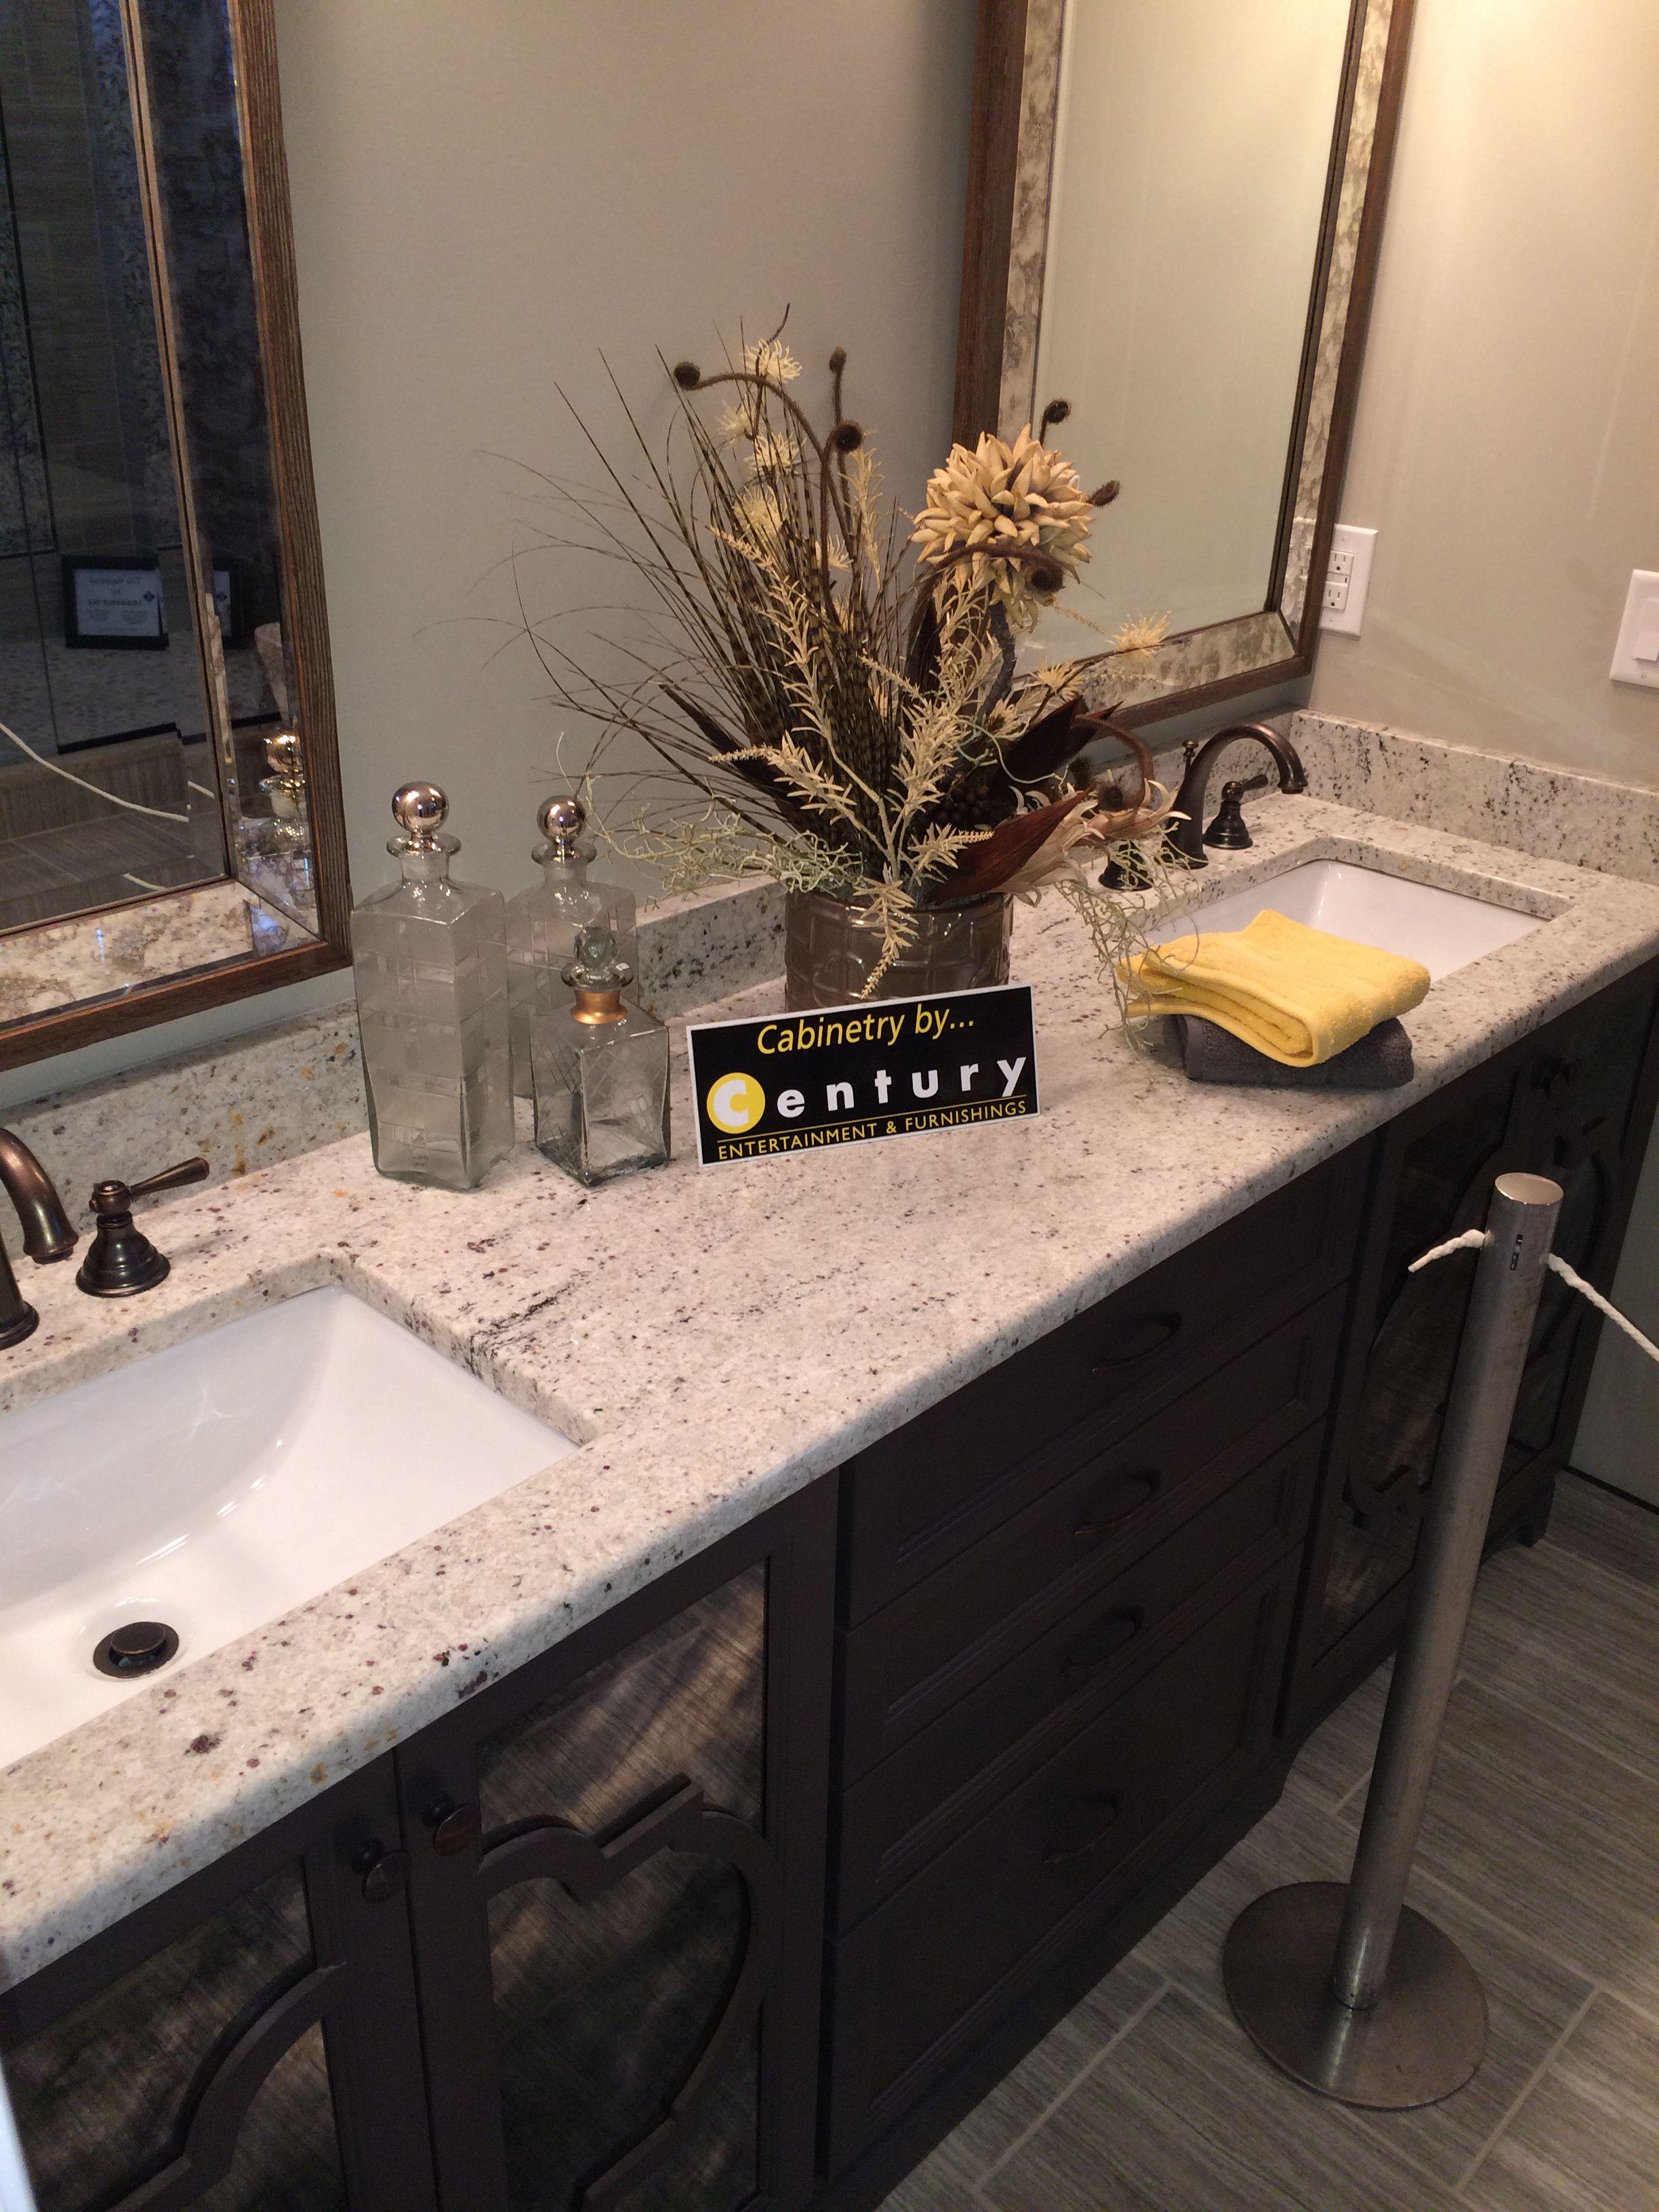 Colonial White Granite With Dark Vanity Visit Globalgranite Com For Your Natural Stone Nee Granite Bathroom Countertops Vanity Backsplash Grey Bathroom Vanity